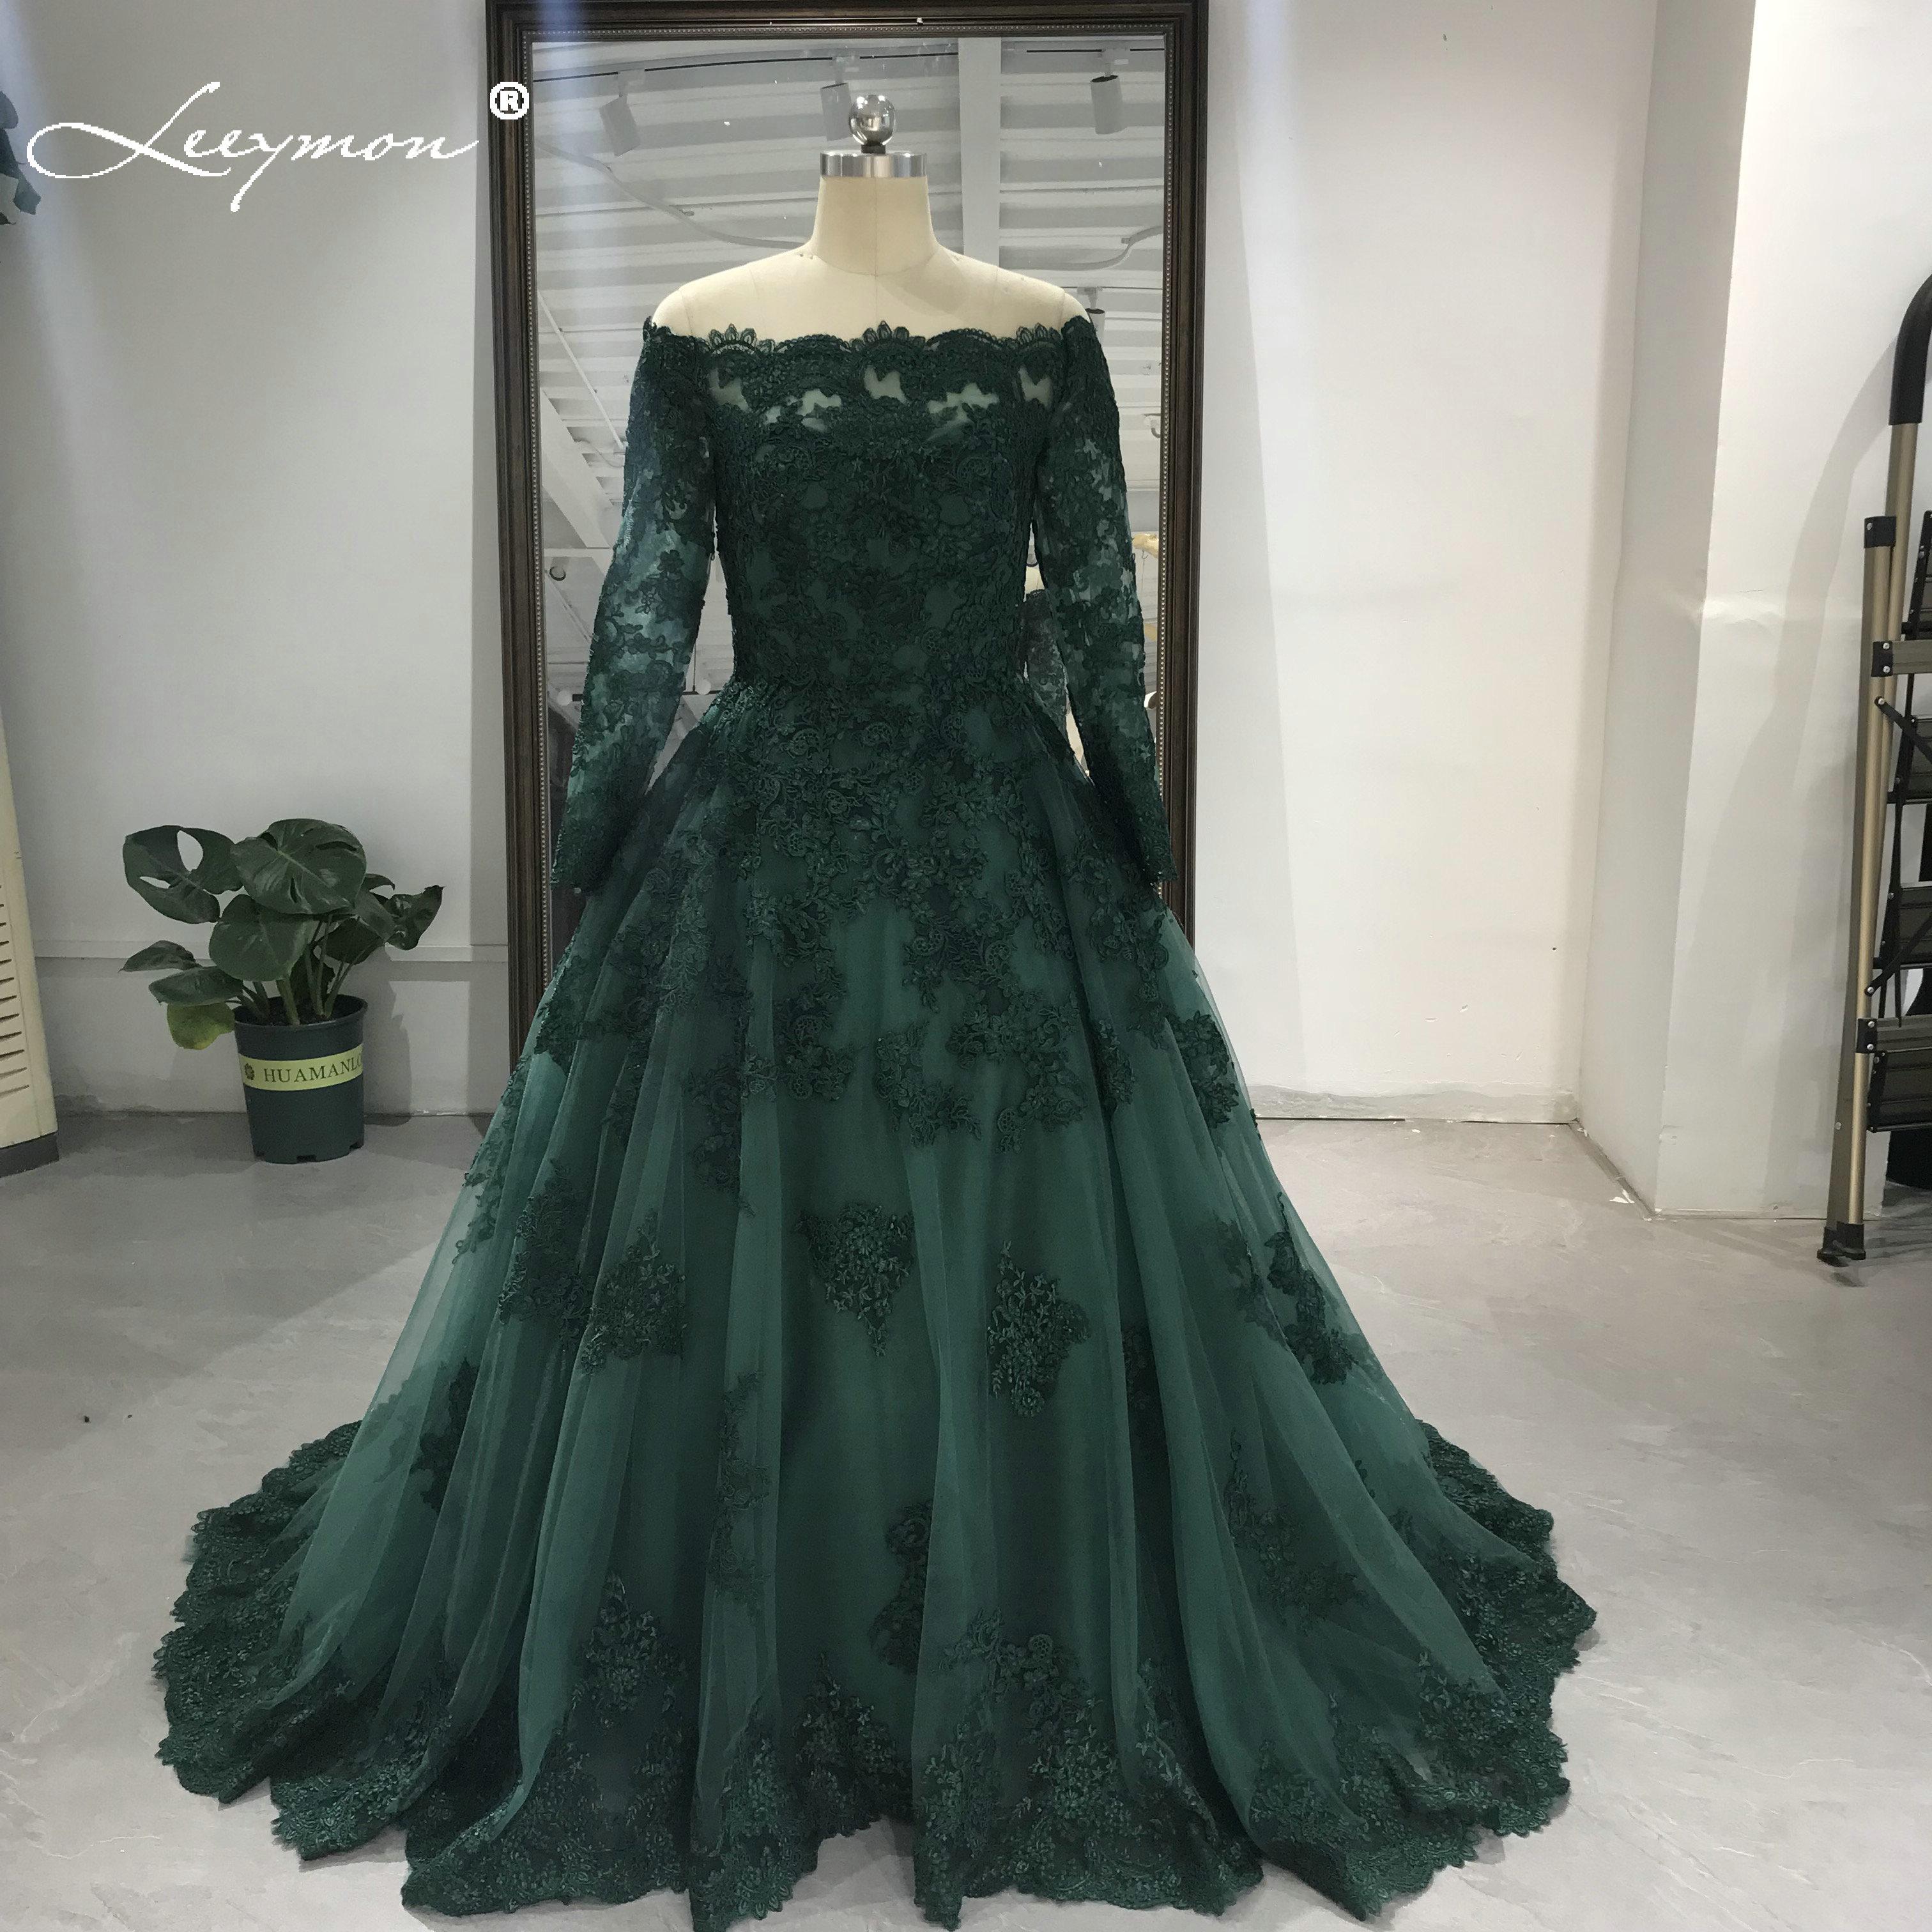 Leeymon-فستان زفاف دانتيل أخضر ، ياقة قارب ، أكمام طويلة ، ثوب زفاف